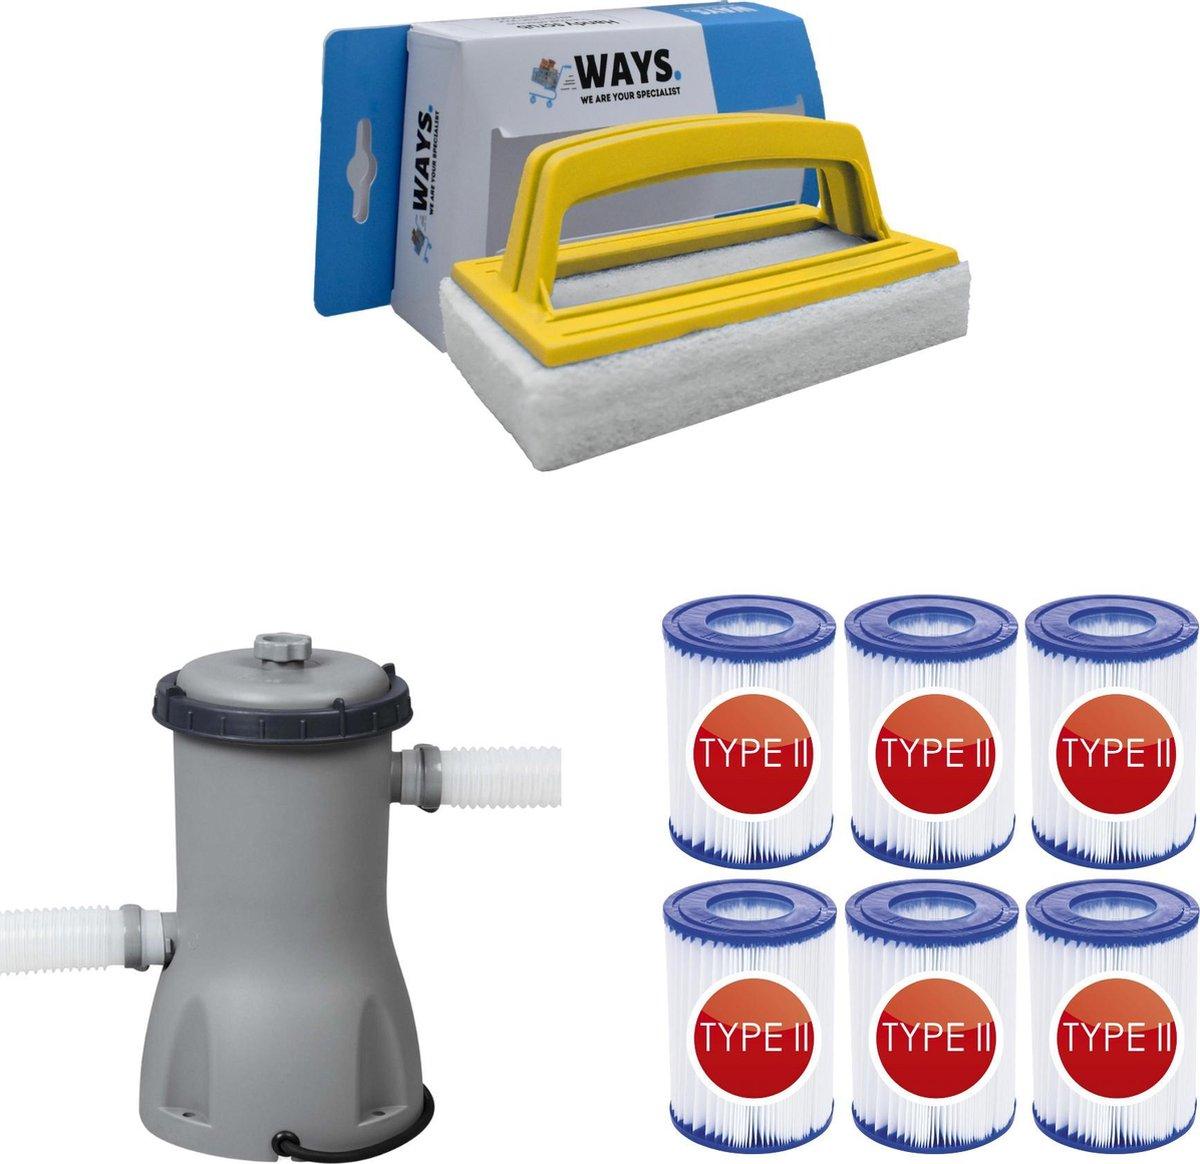 WAYS - Zwembad Onderhoud - Bestway Filterpomp 2006 L/h & 6 Bestway Filters Type II